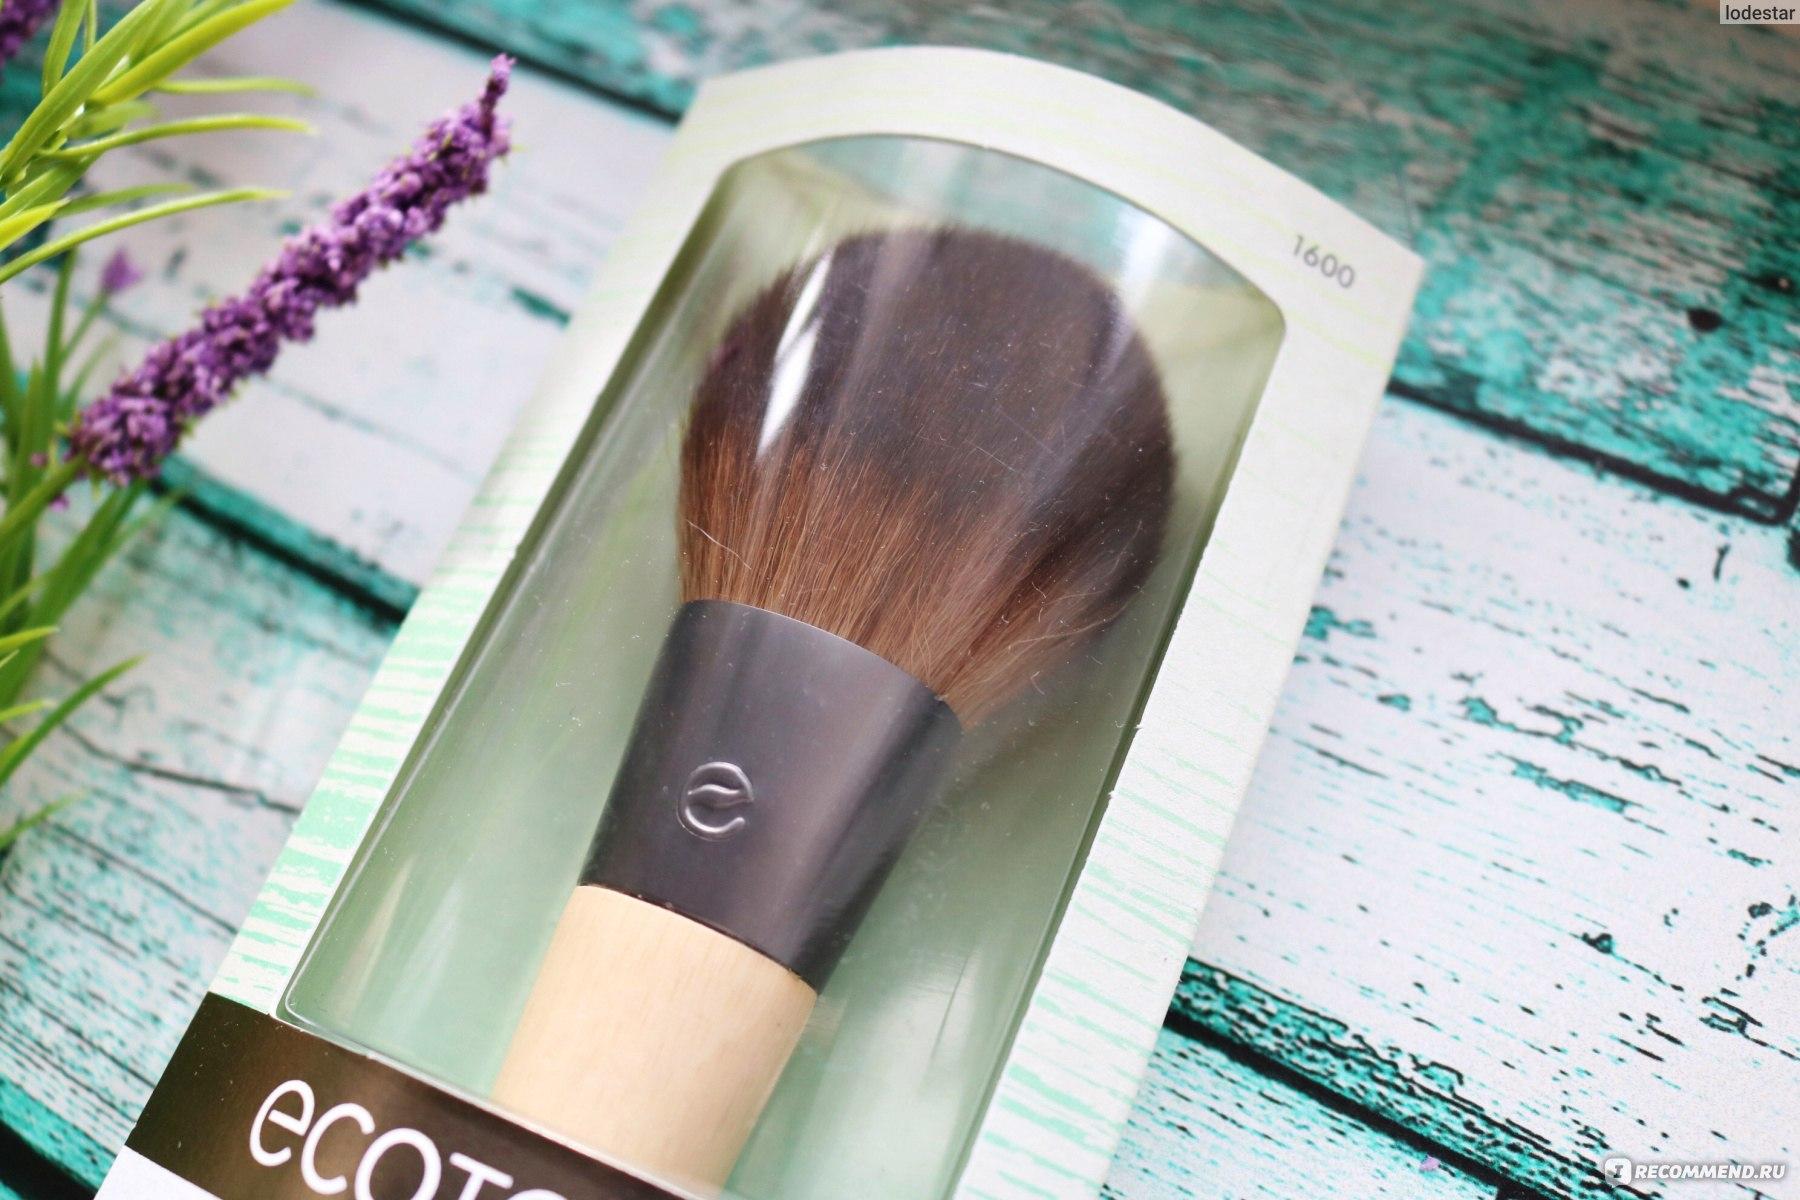 Ecotools Full Powder Eco Tools 1600 Brush